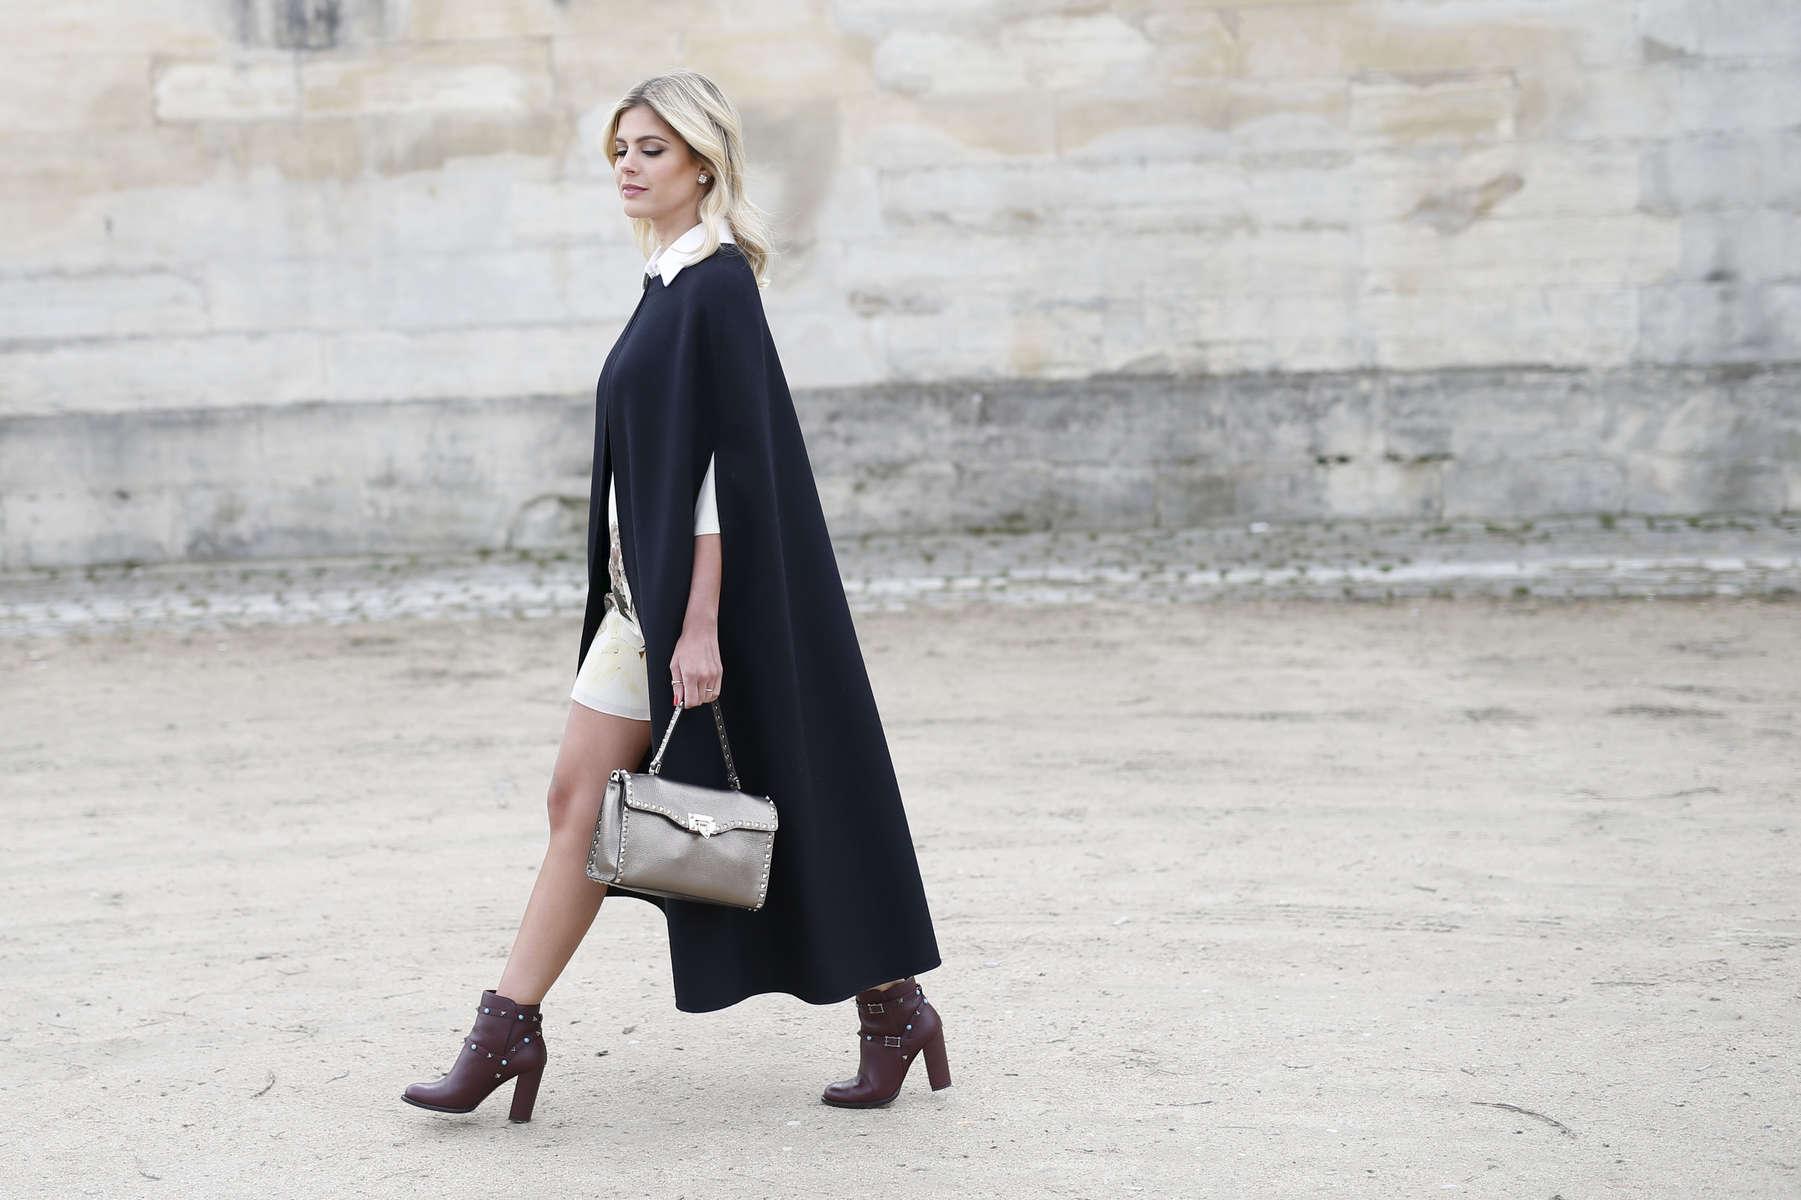 Lala Rudge - Paris Fashion Week, March 2016